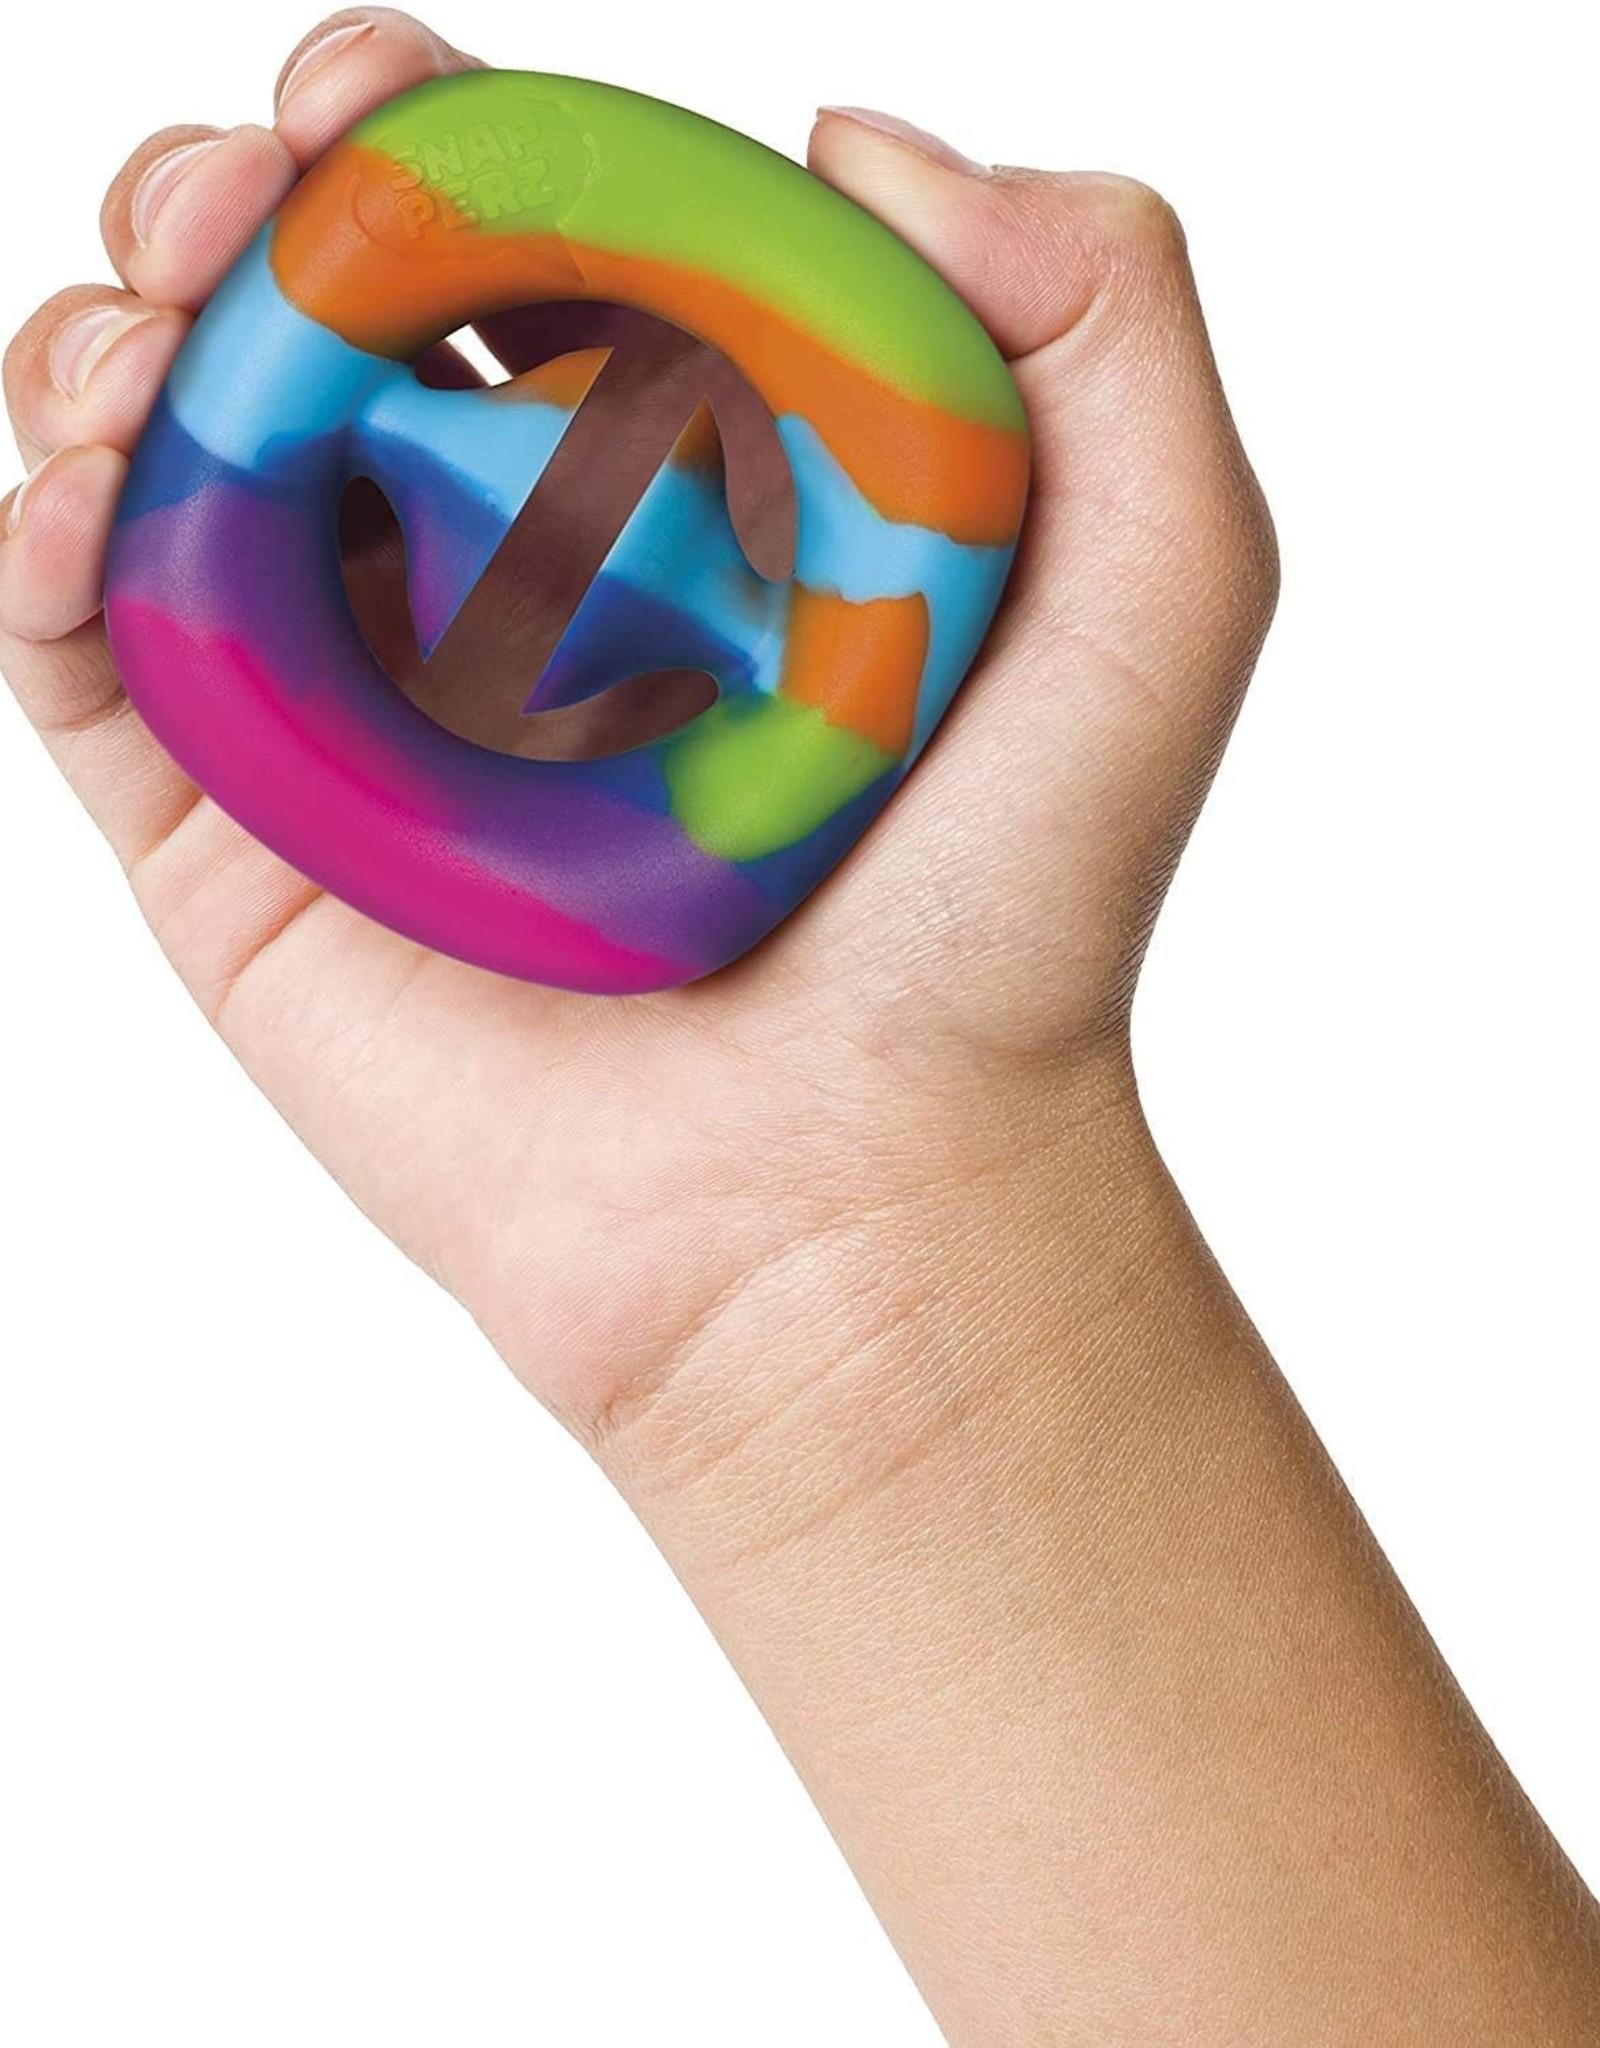 Toysmith Snapperz Rainbow